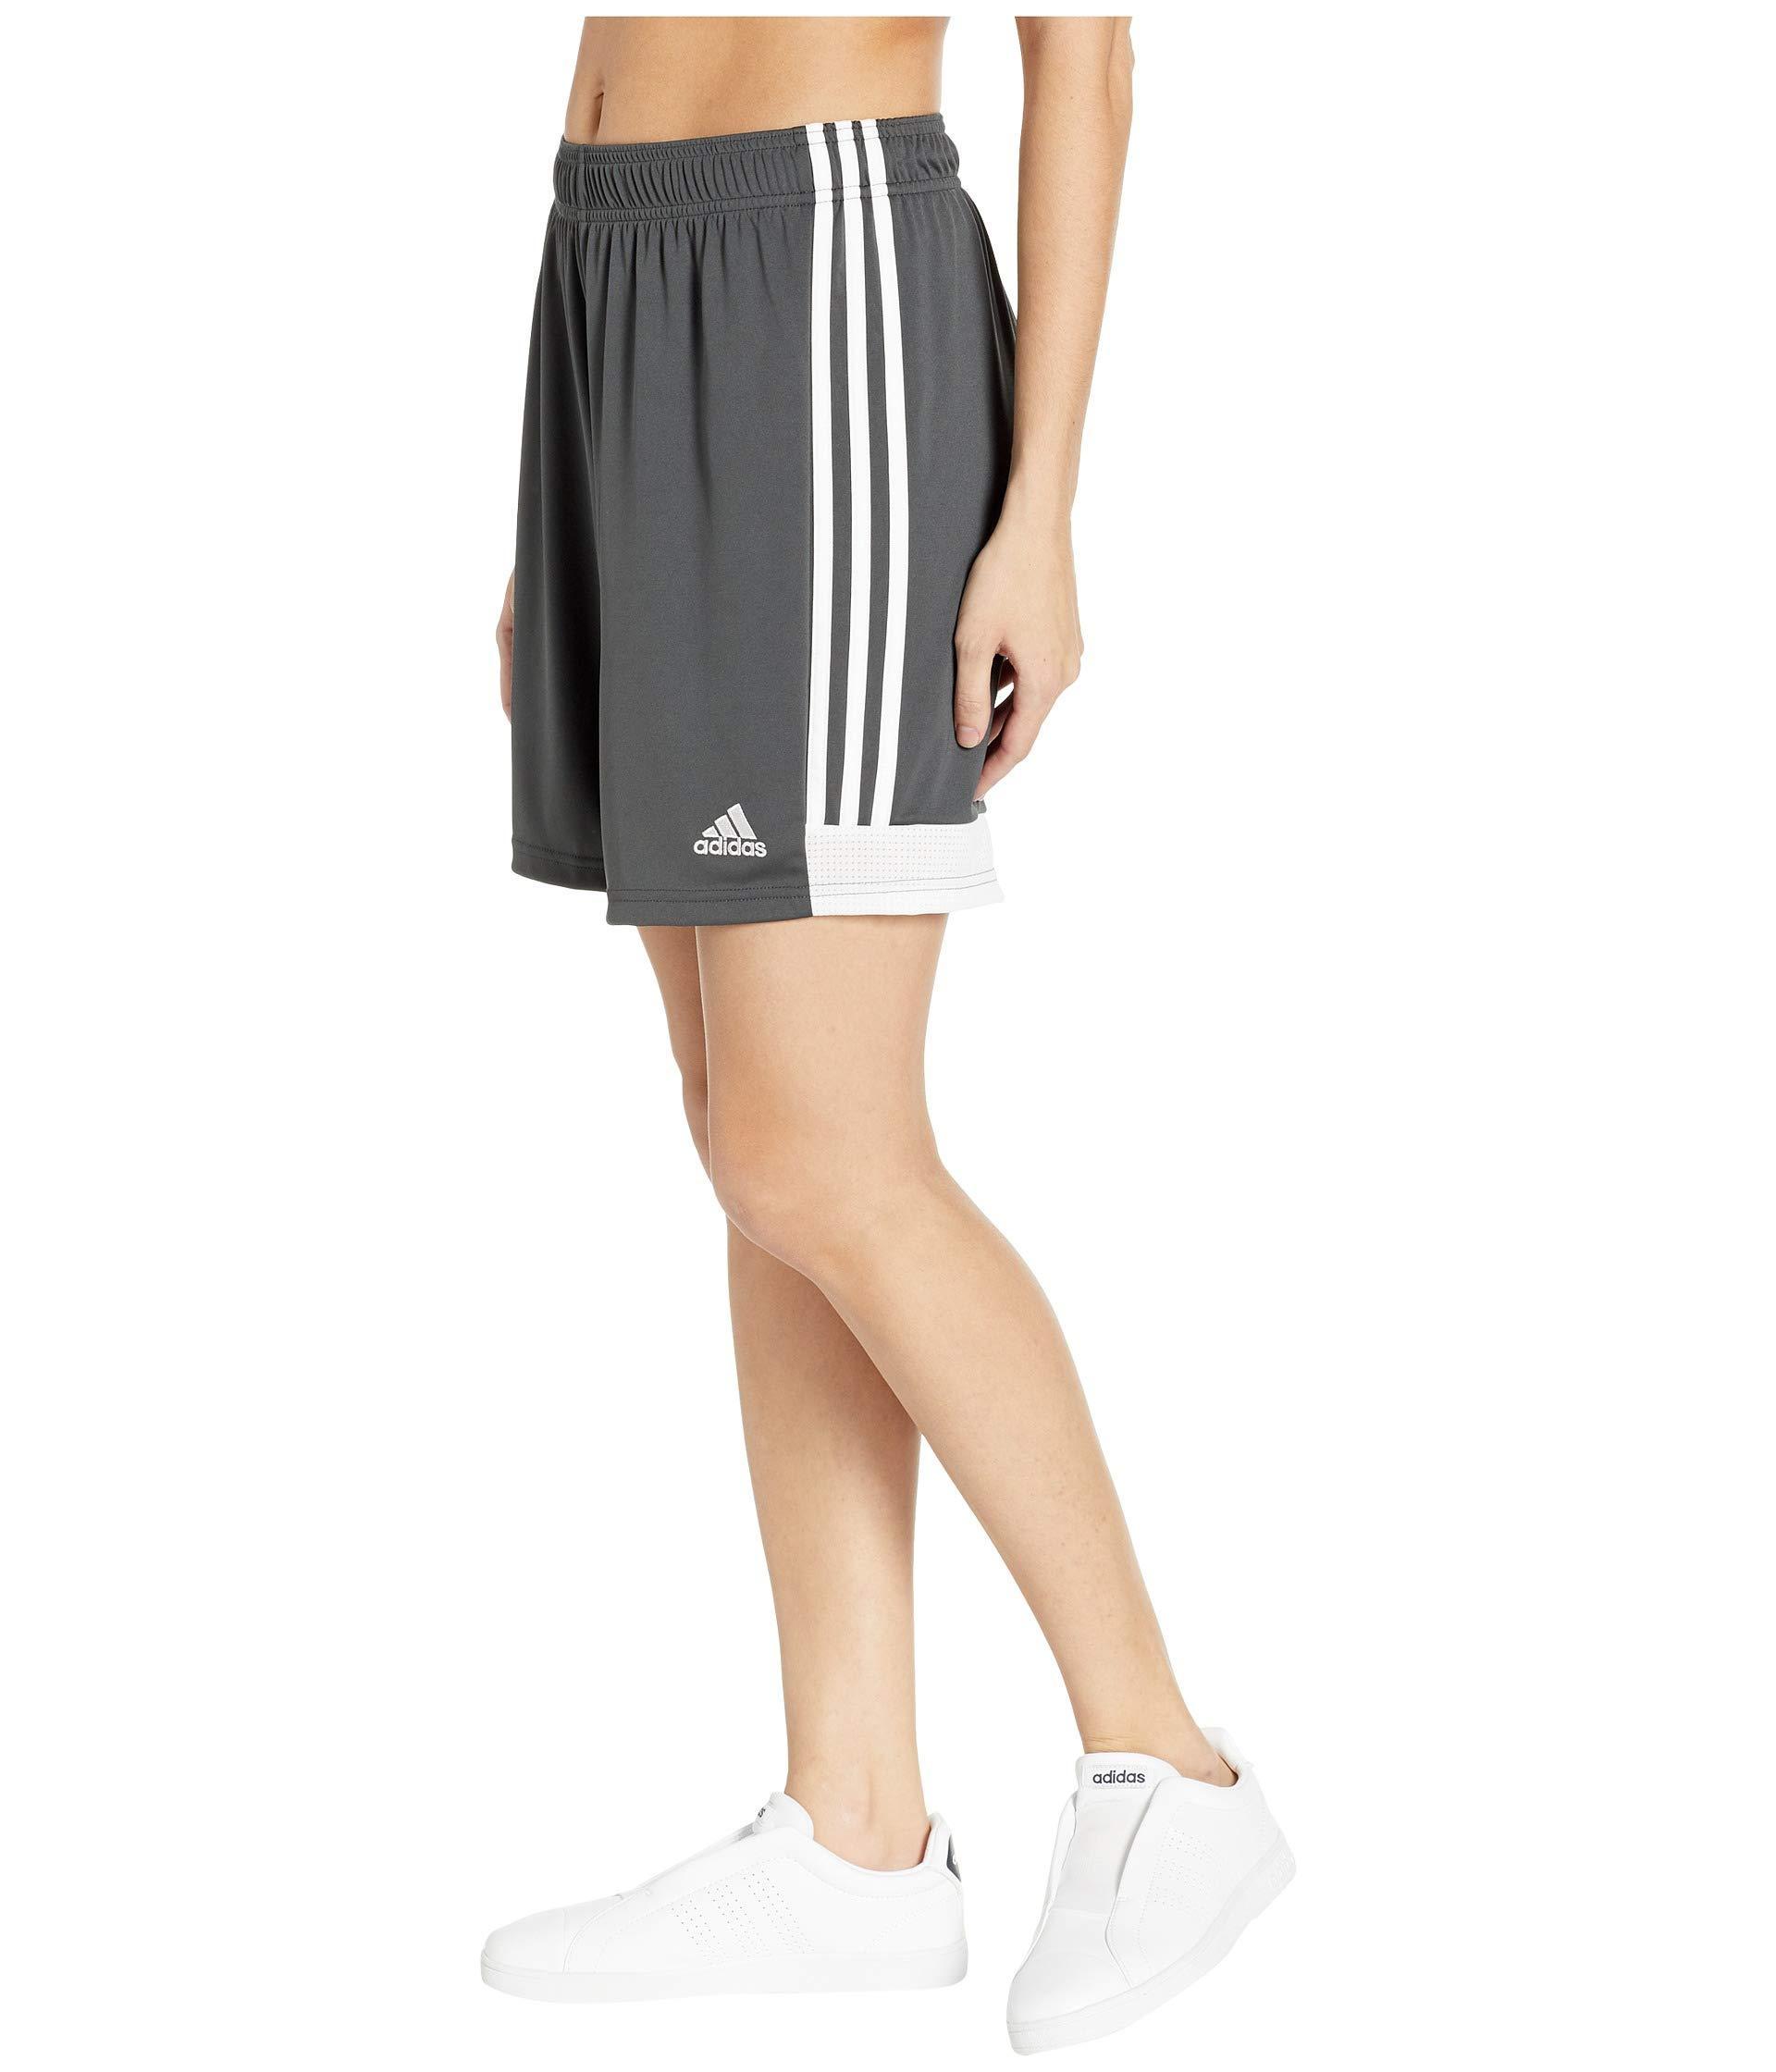 0d5f2873c Lyst - adidas Tastigo '19 Shorts (white/black) Women's Shorts in Gray